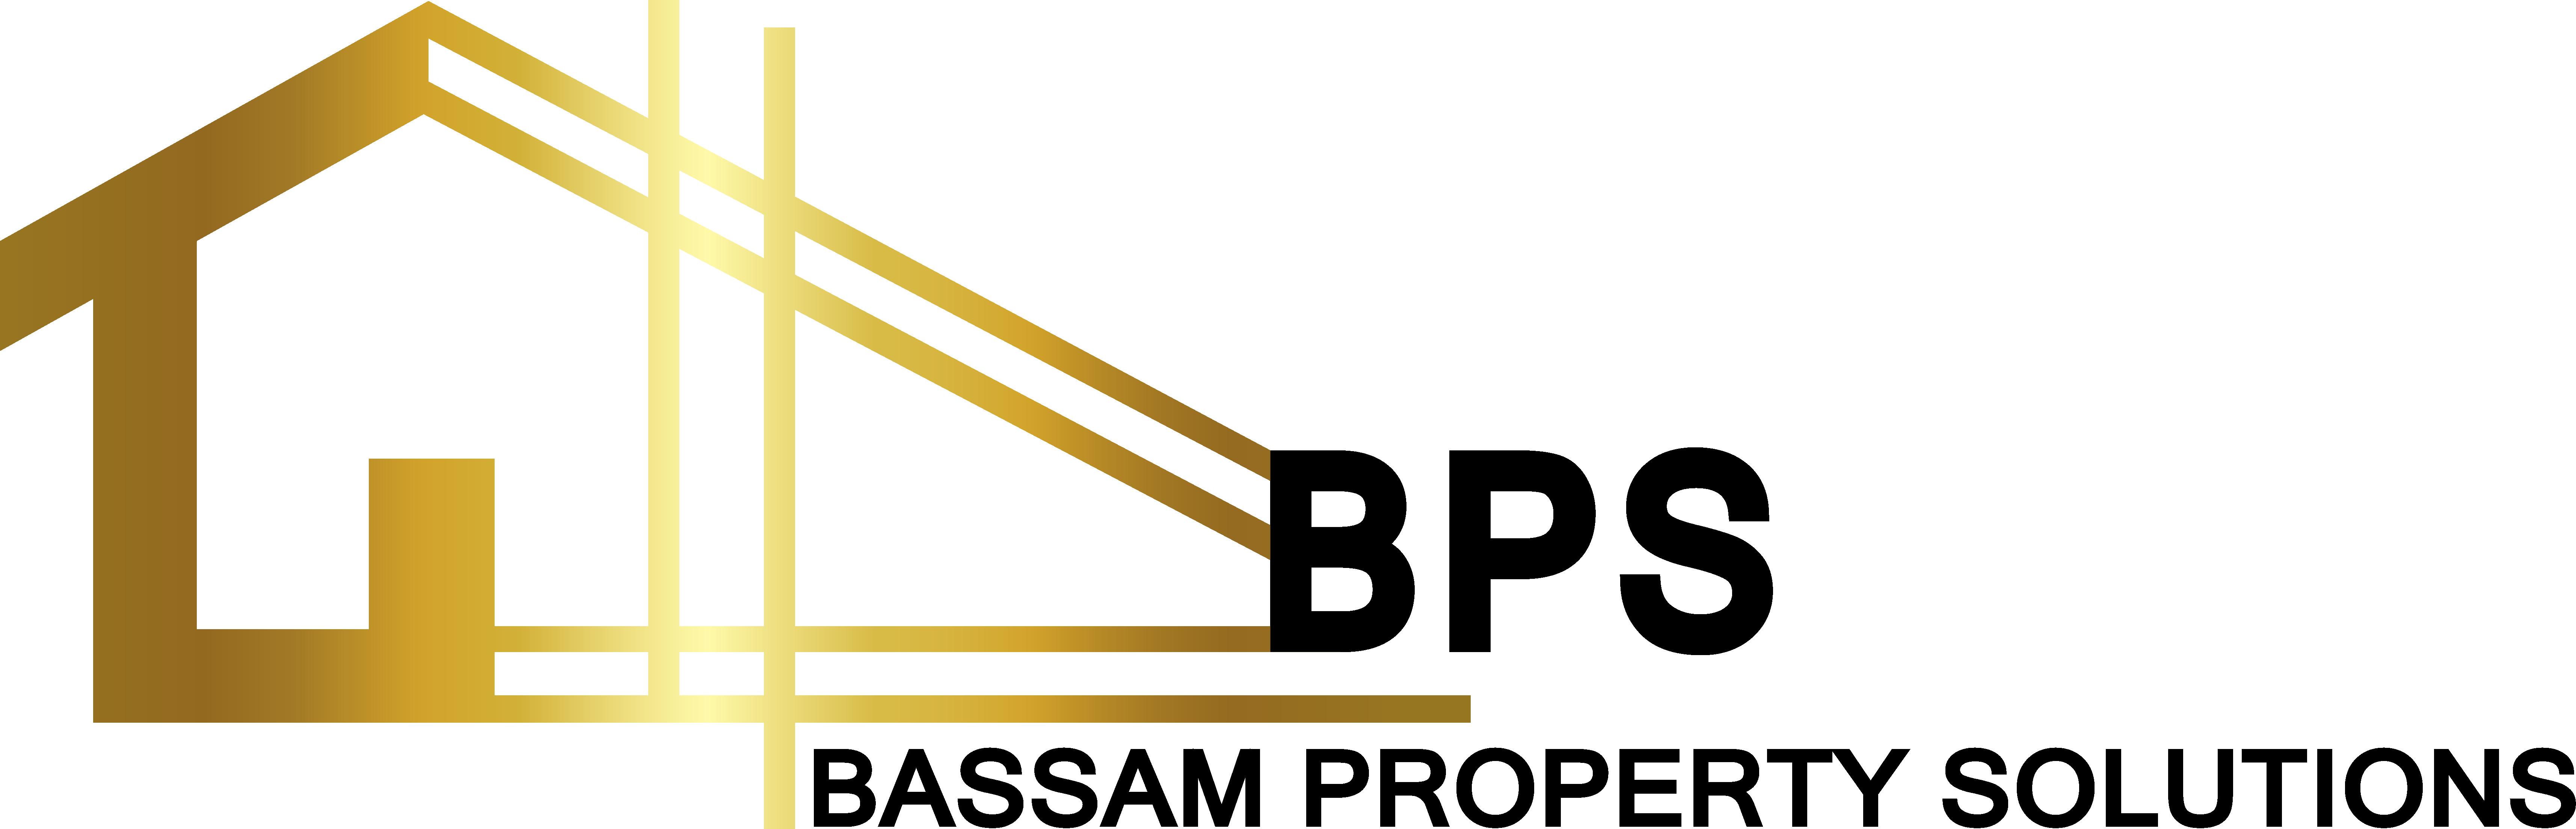 Bassam Property Solutions Logo